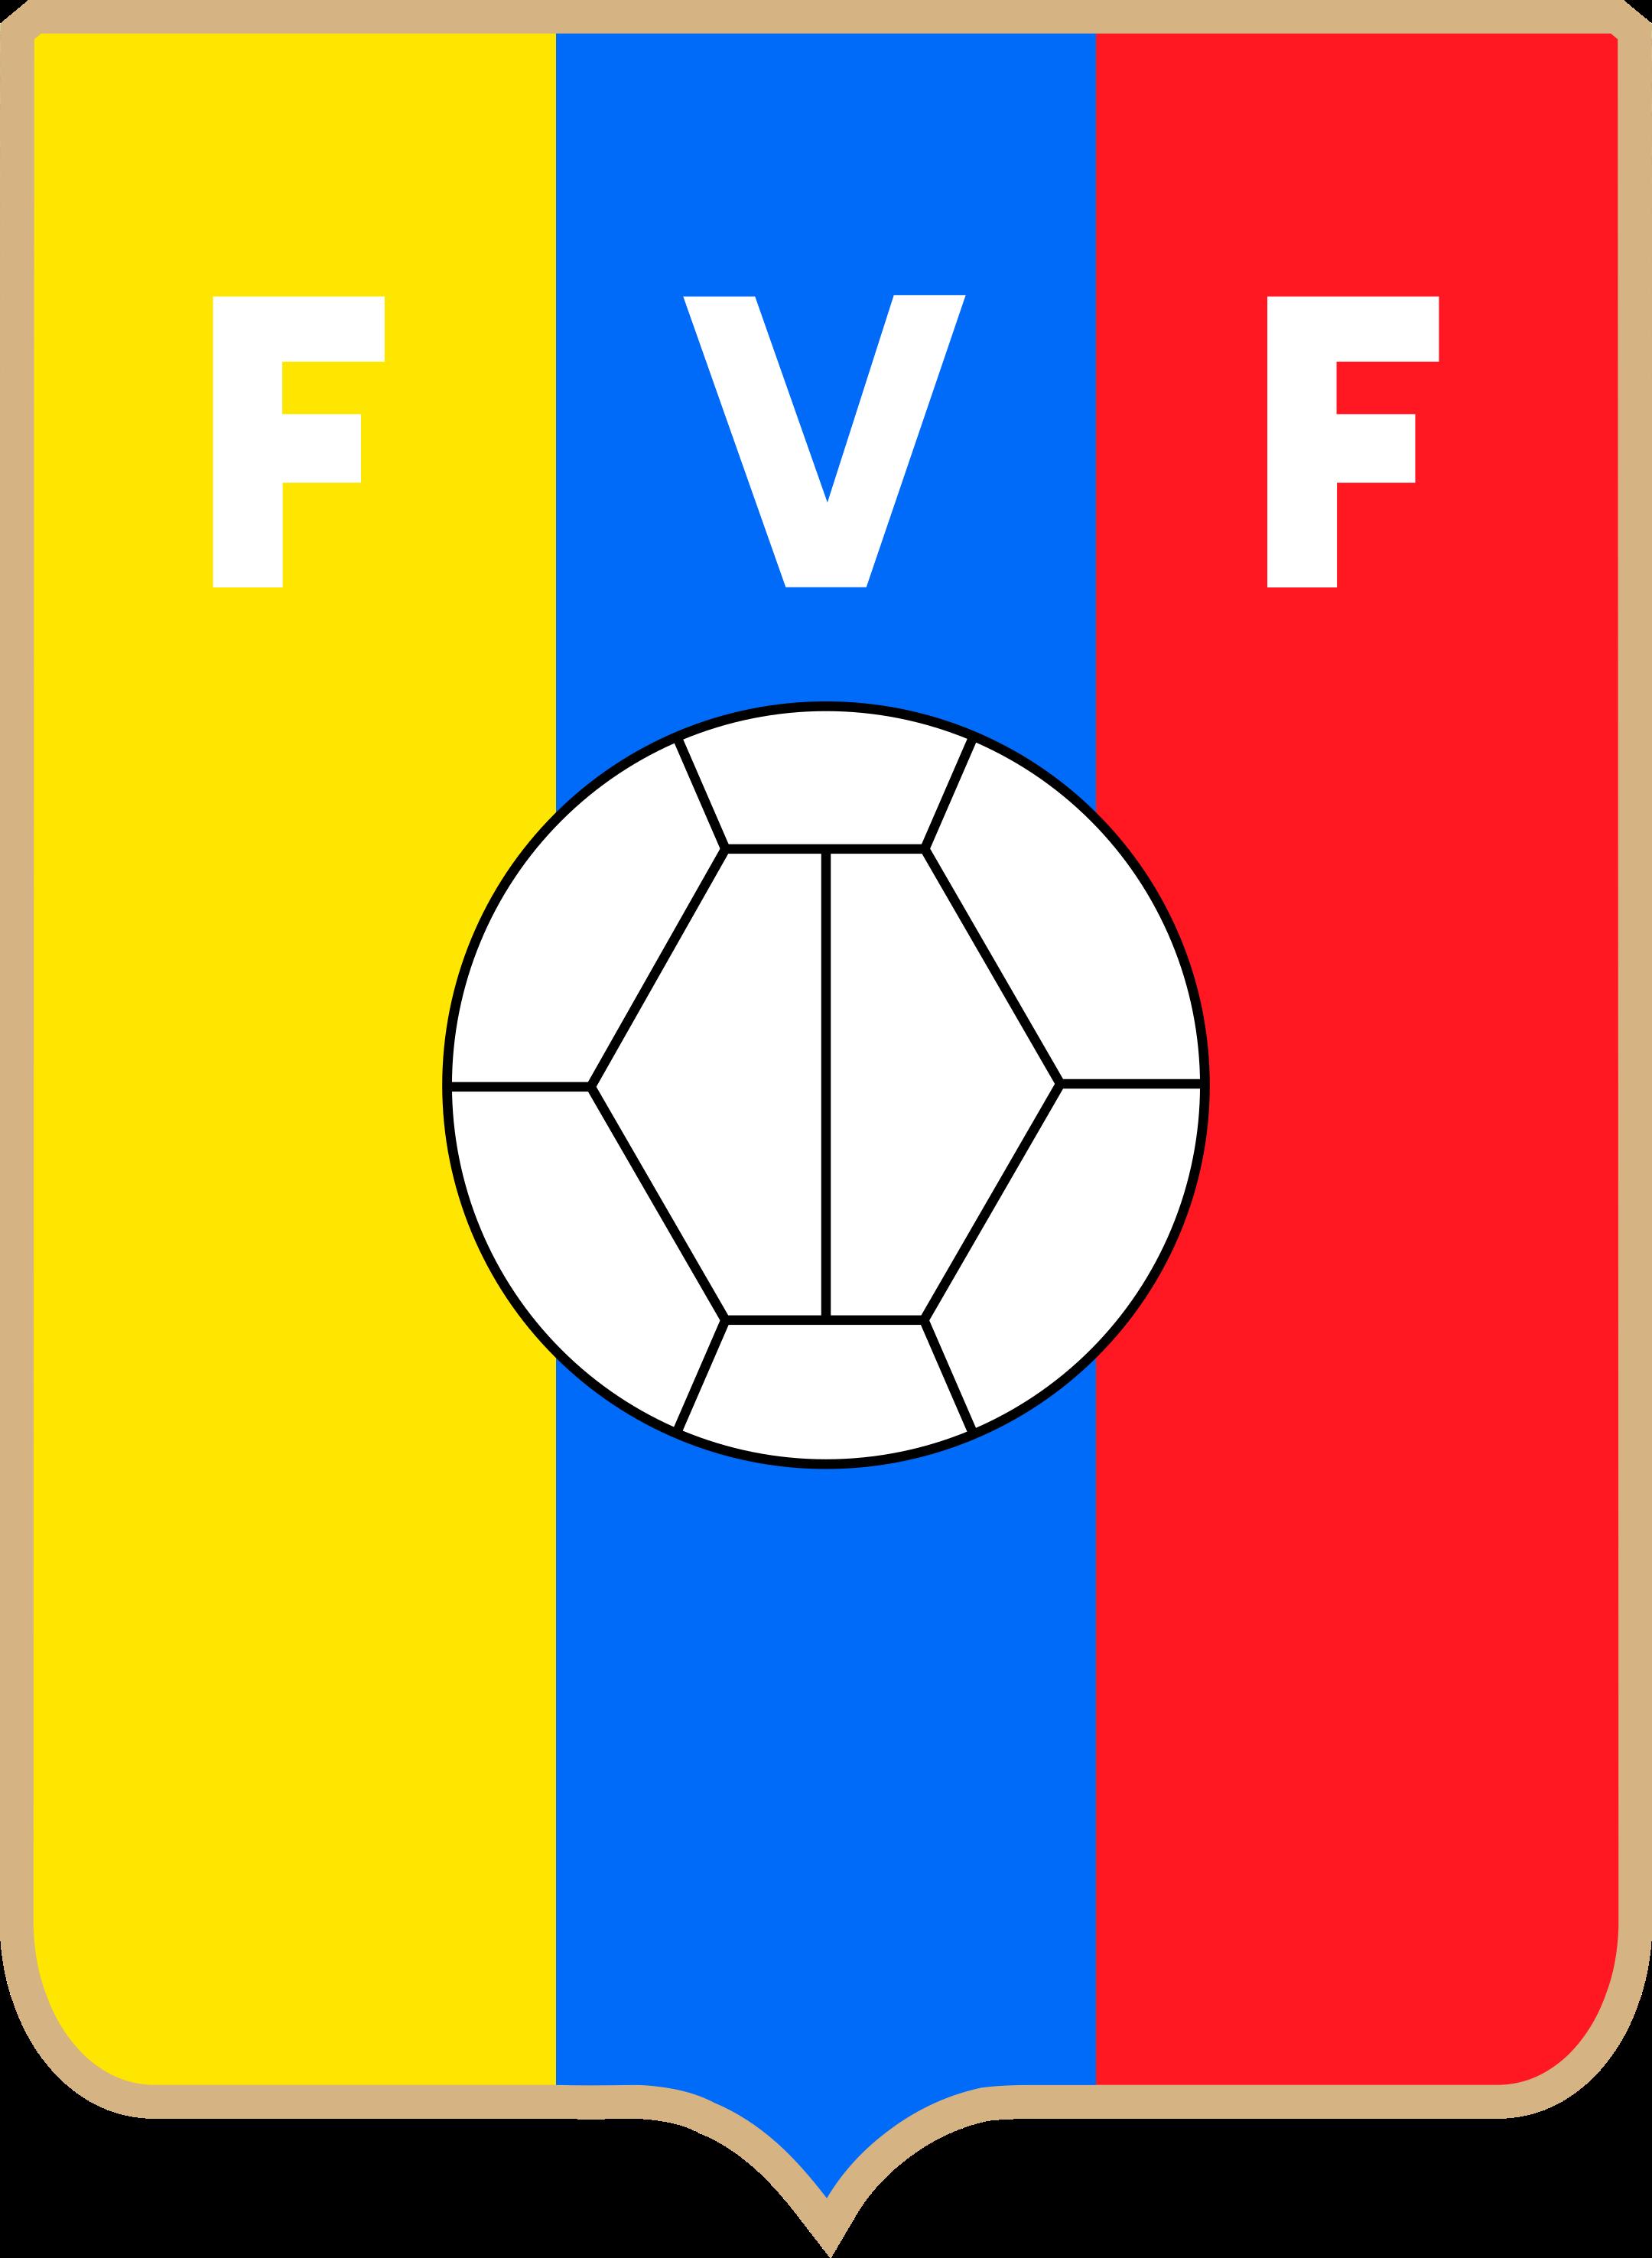 fvf seleccion de futbol de venezuela logo 2 - FVF Logo - Selección de fútbol de Venezuela Logo